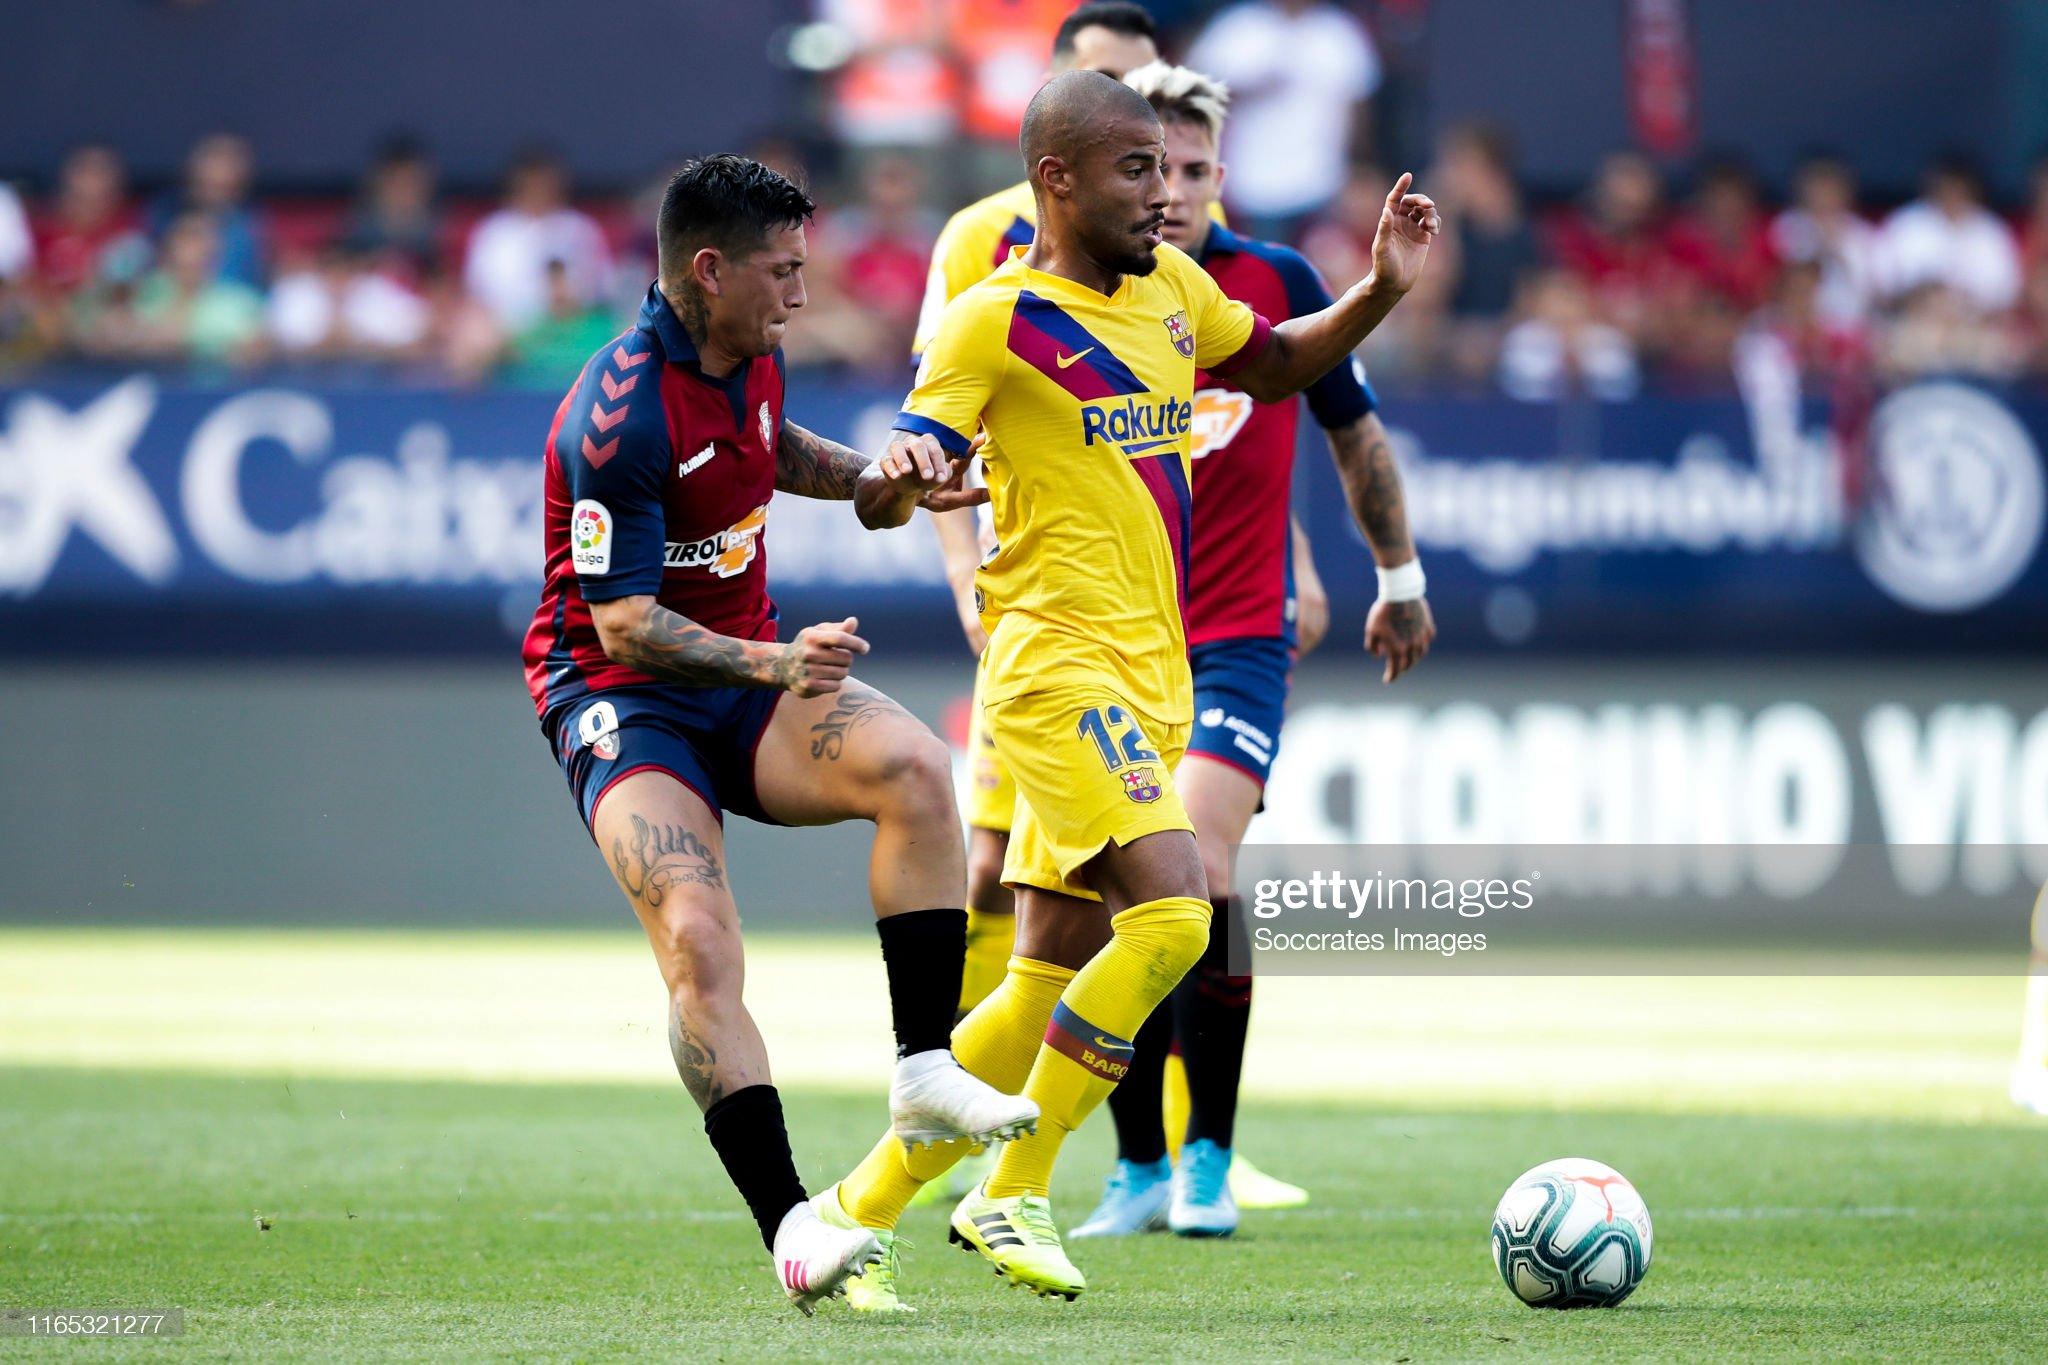 صور مباراة : أوساسونا - برشلونة 2-2 ( 31-08-2019 )  Chimy-avila-of-ca-osasuna-rafinha-of-fc-barcelona-during-the-la-liga-picture-id1165321277?s=2048x2048